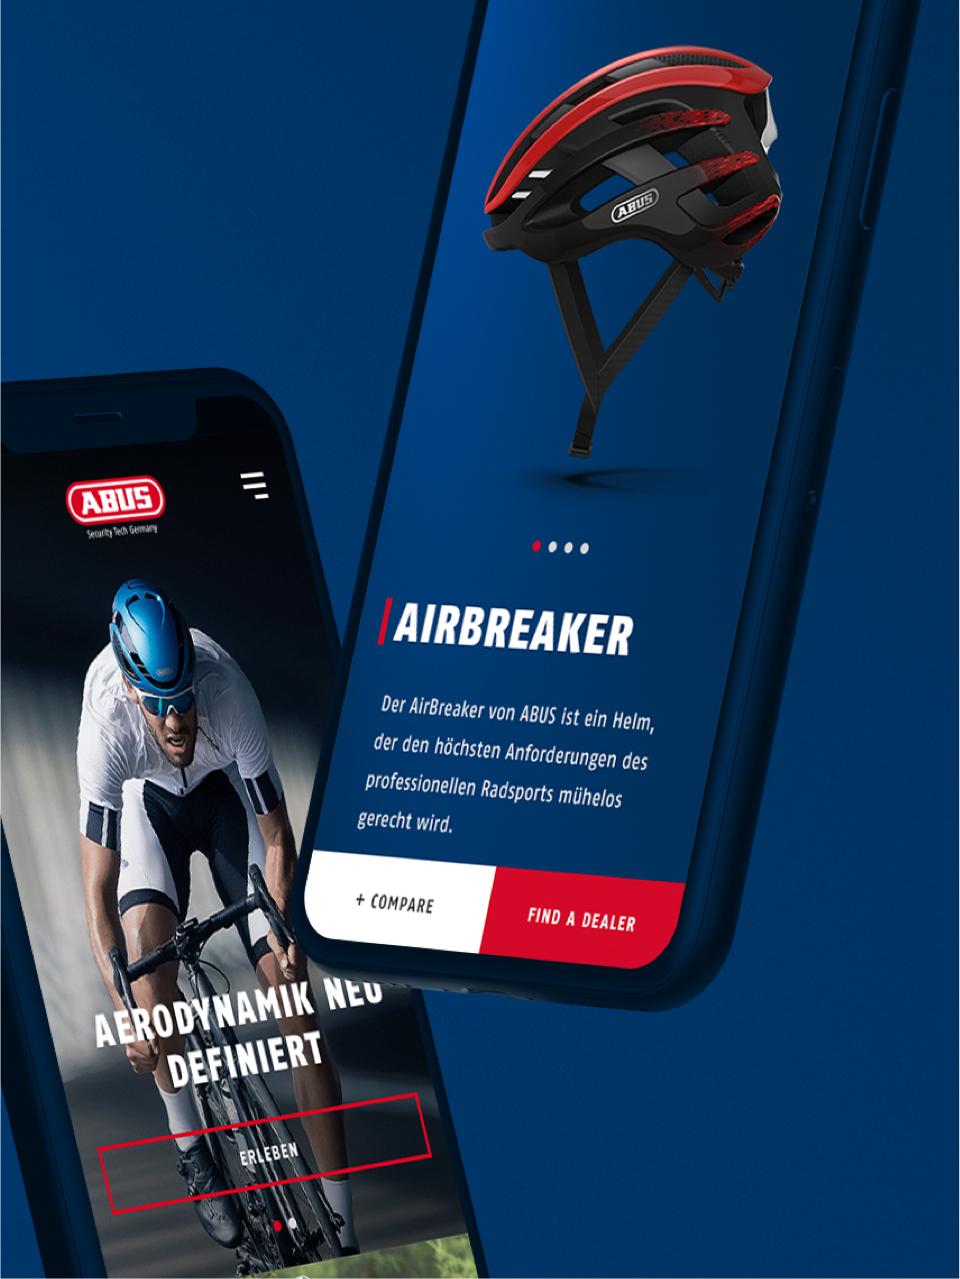 ABUS - Airbreaker